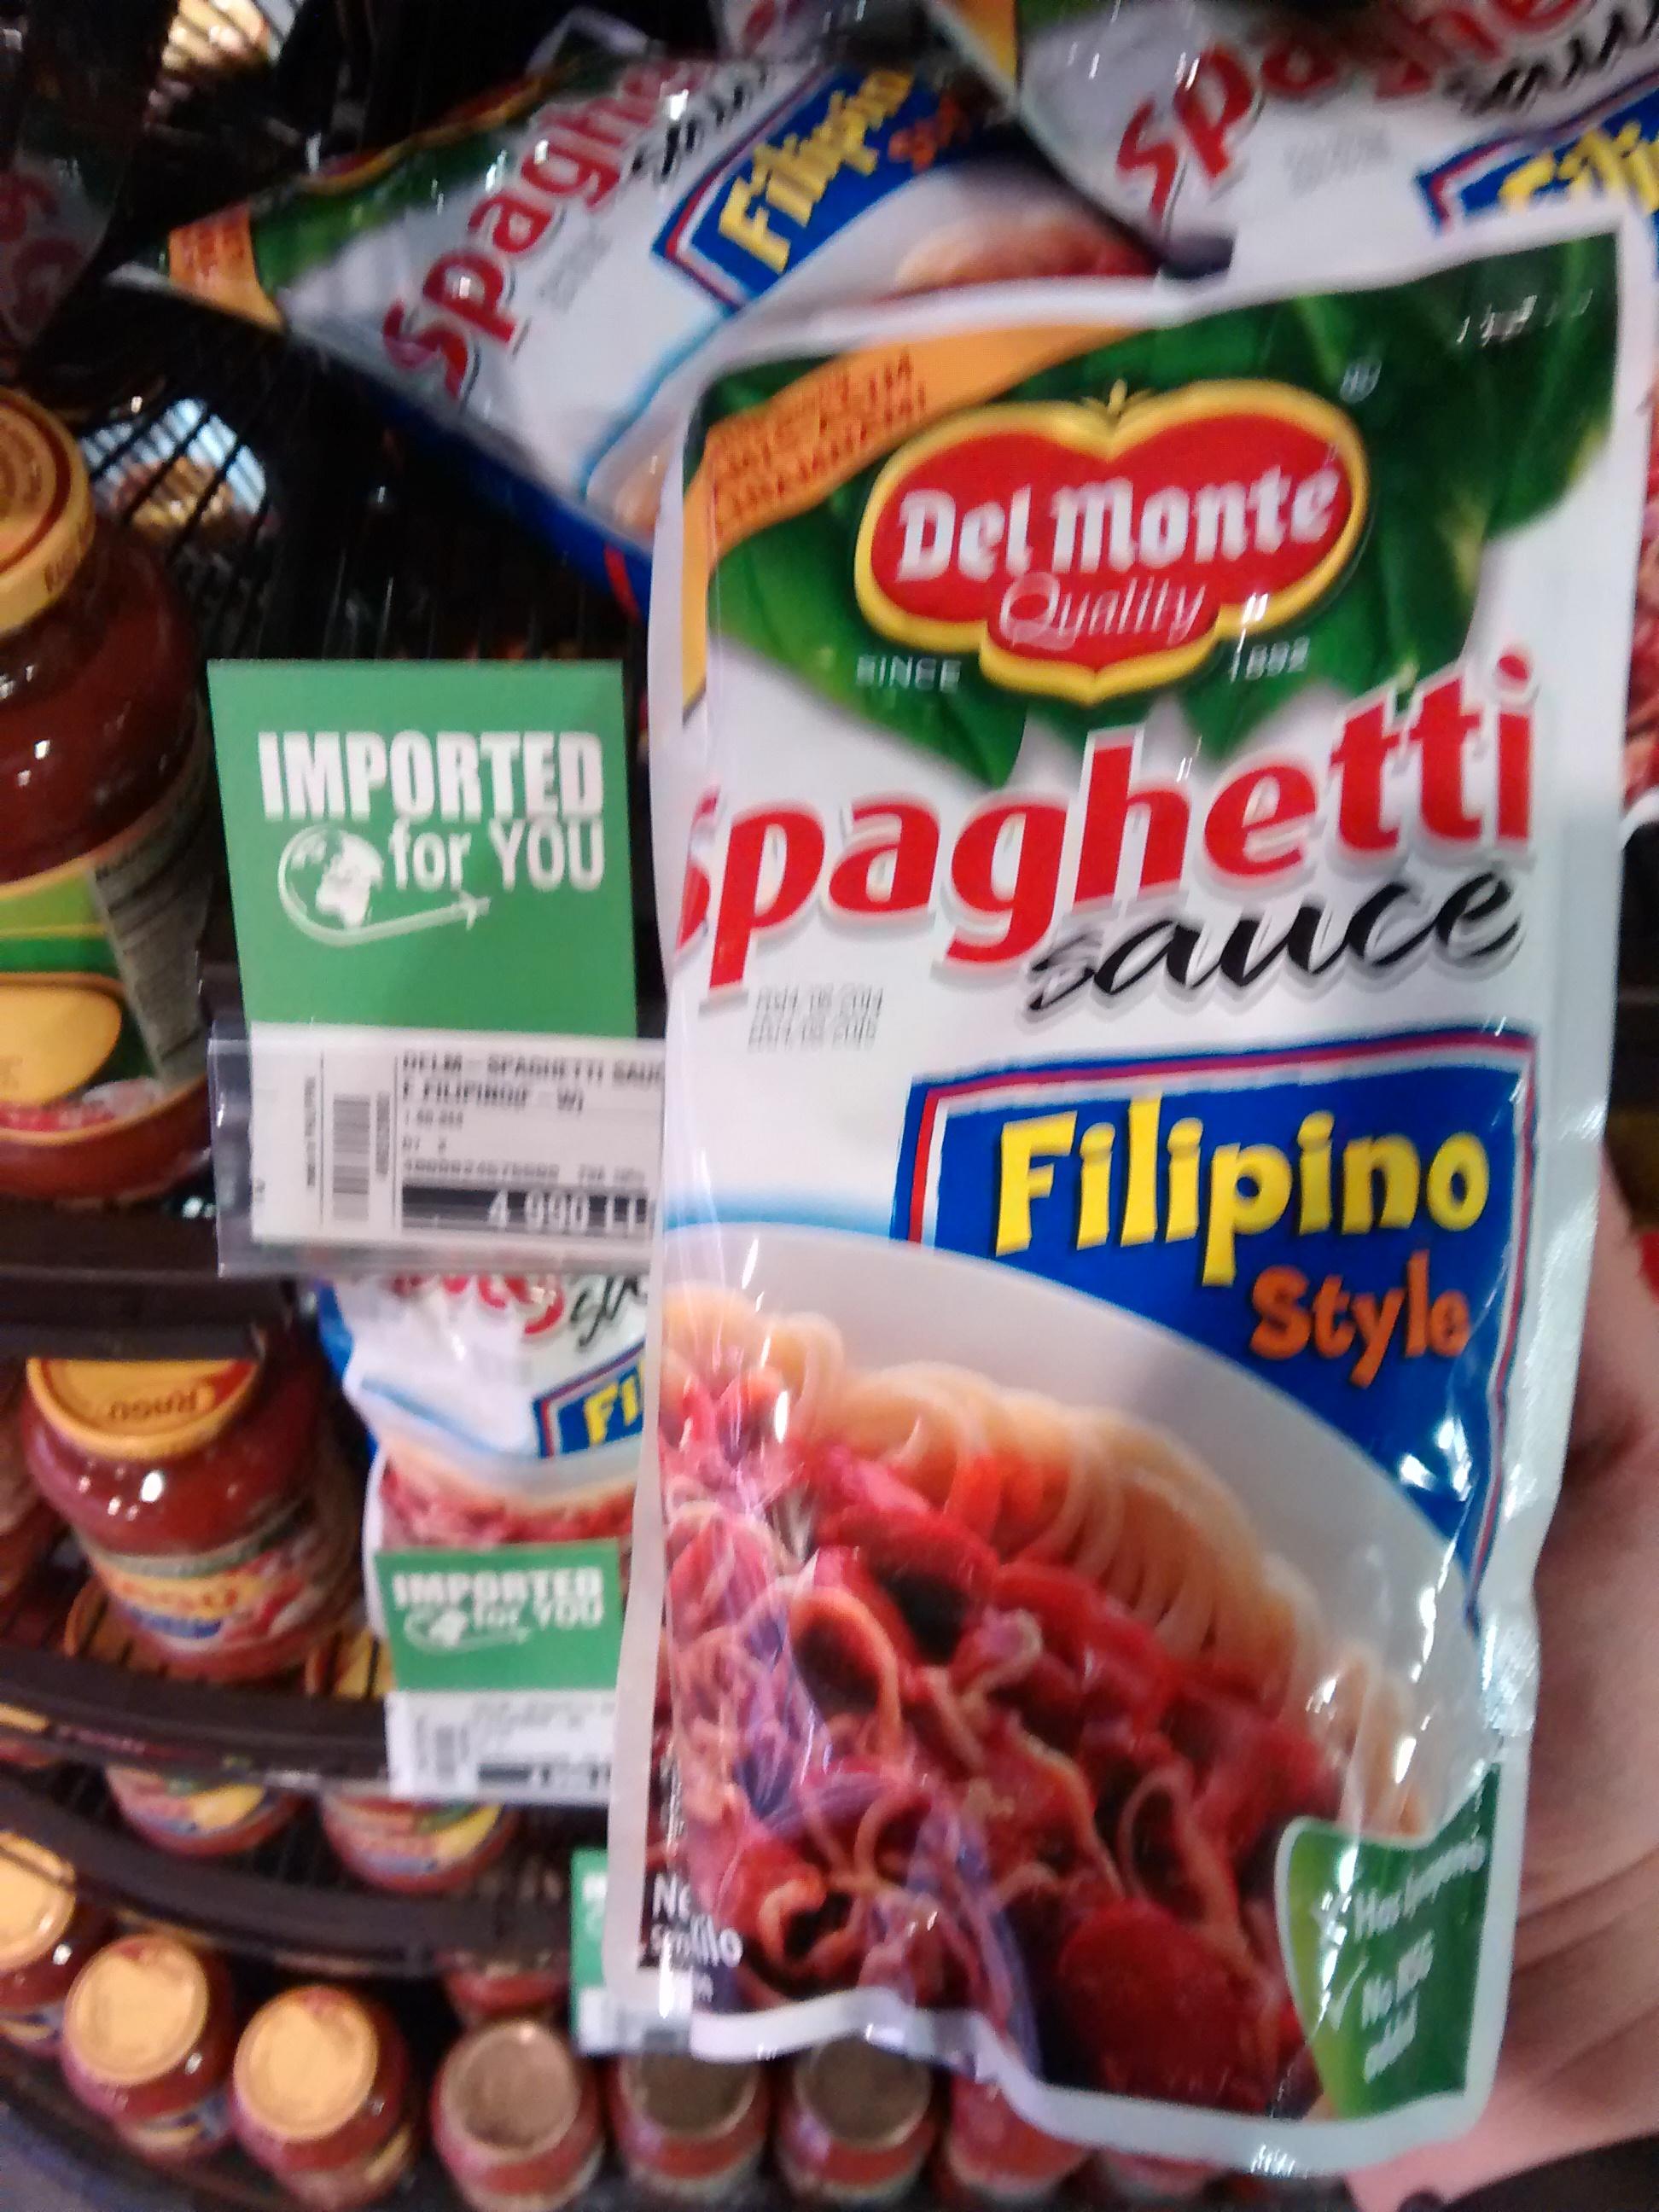 Del Monte Spaghetti Sauce Filipino Style 4 990 Lebanese Pounds